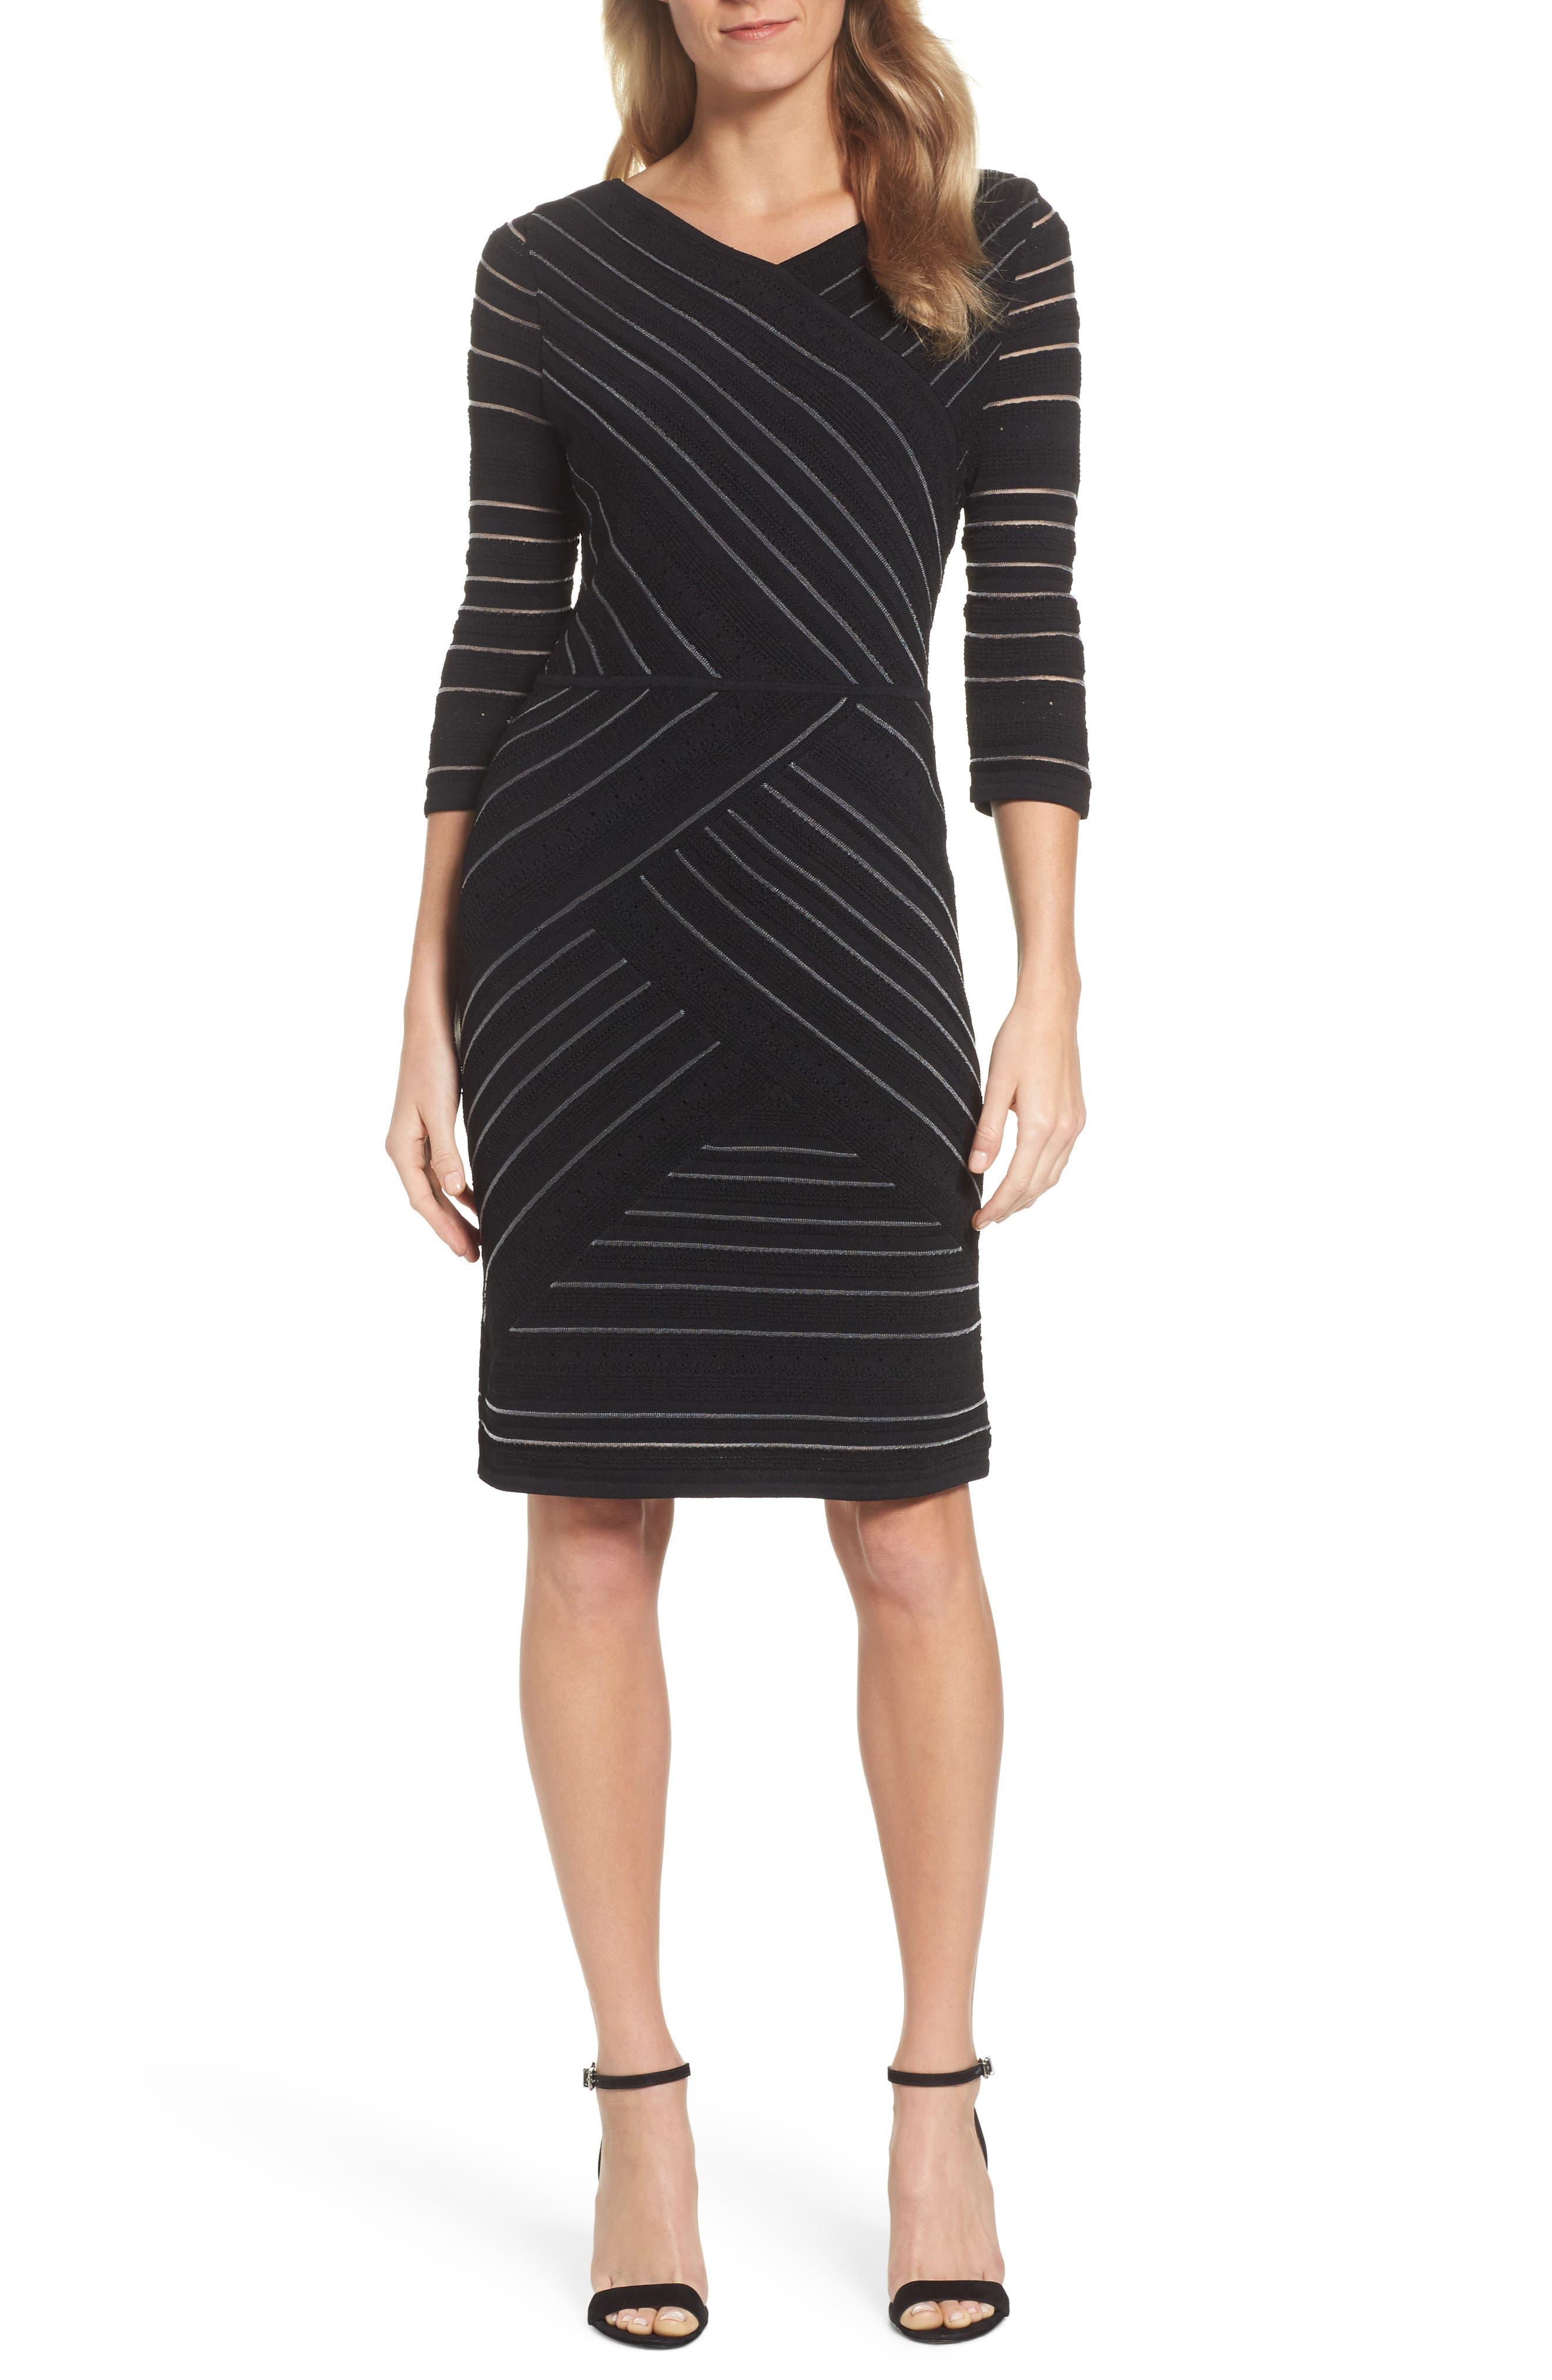 NIC+ ZOE Wrapped Up Sheath Dress,                             Main thumbnail 1, color,                             Black Onyx